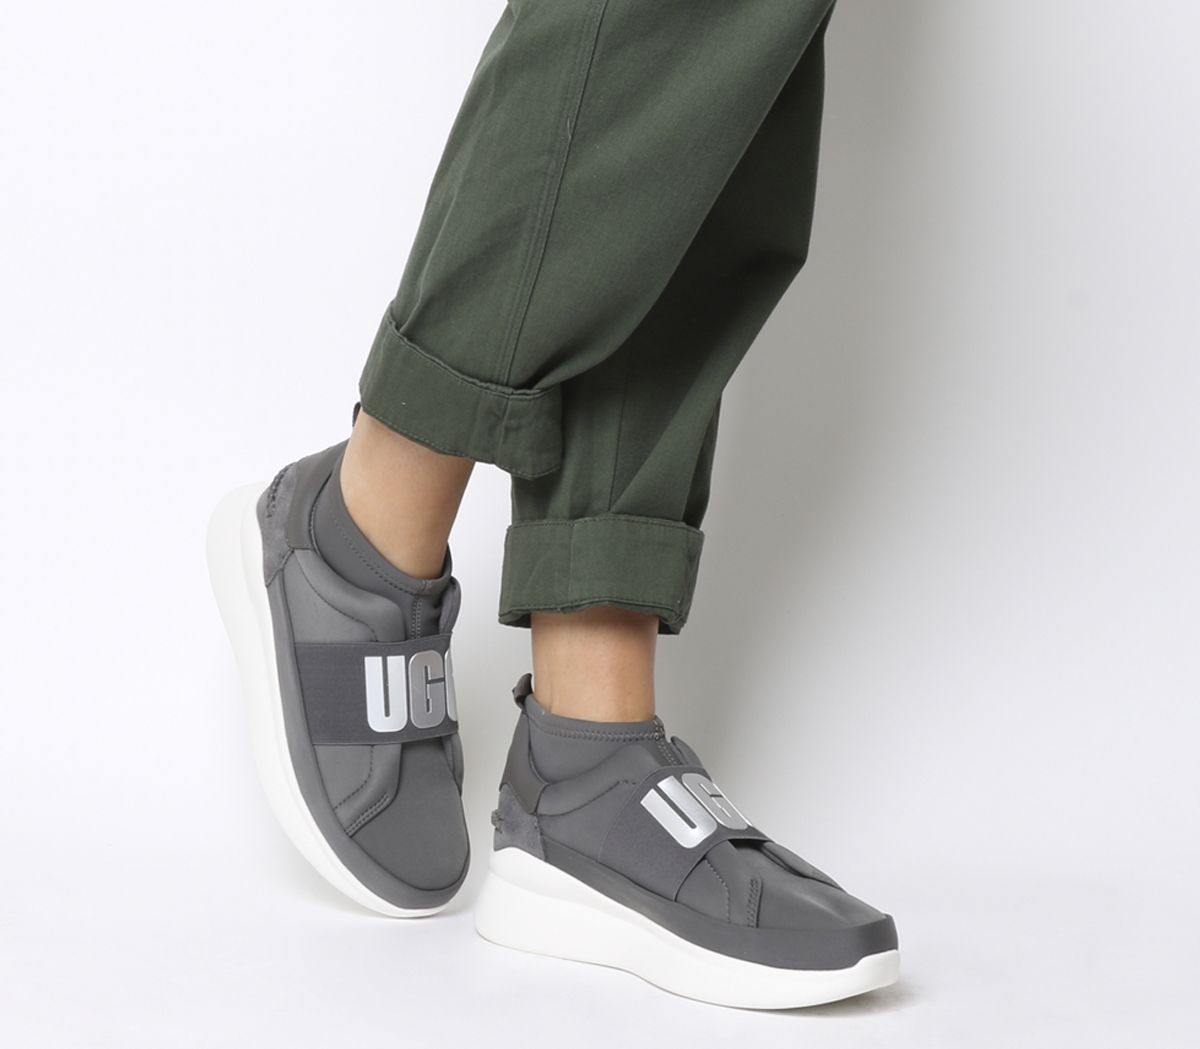 538bb522080 Neutra Sneakers